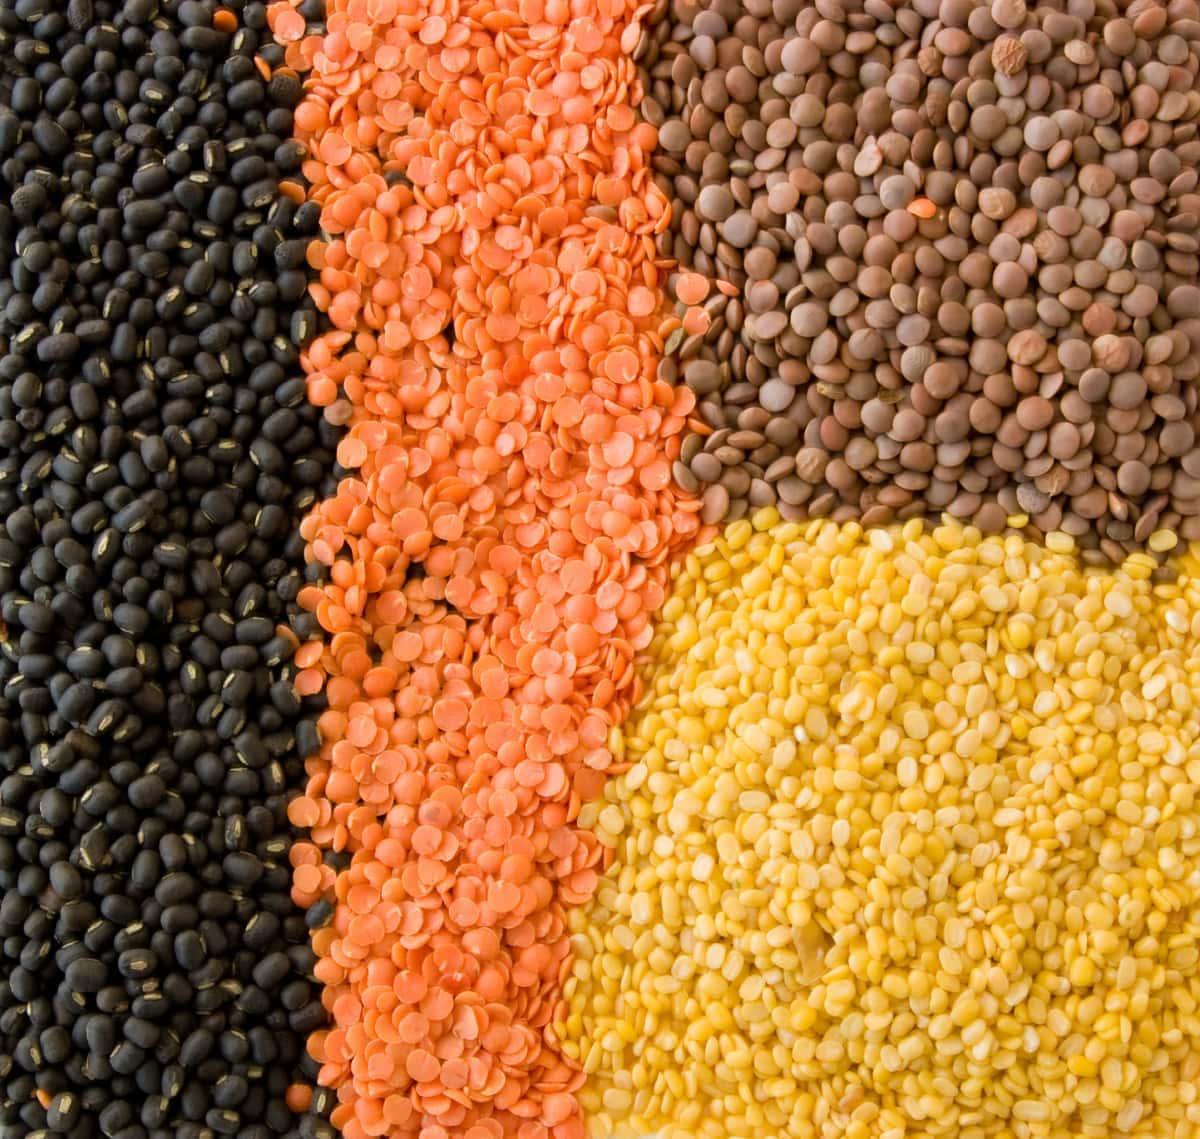 Lentils from black lentils, red lentils, yellow split peas to brown lentils